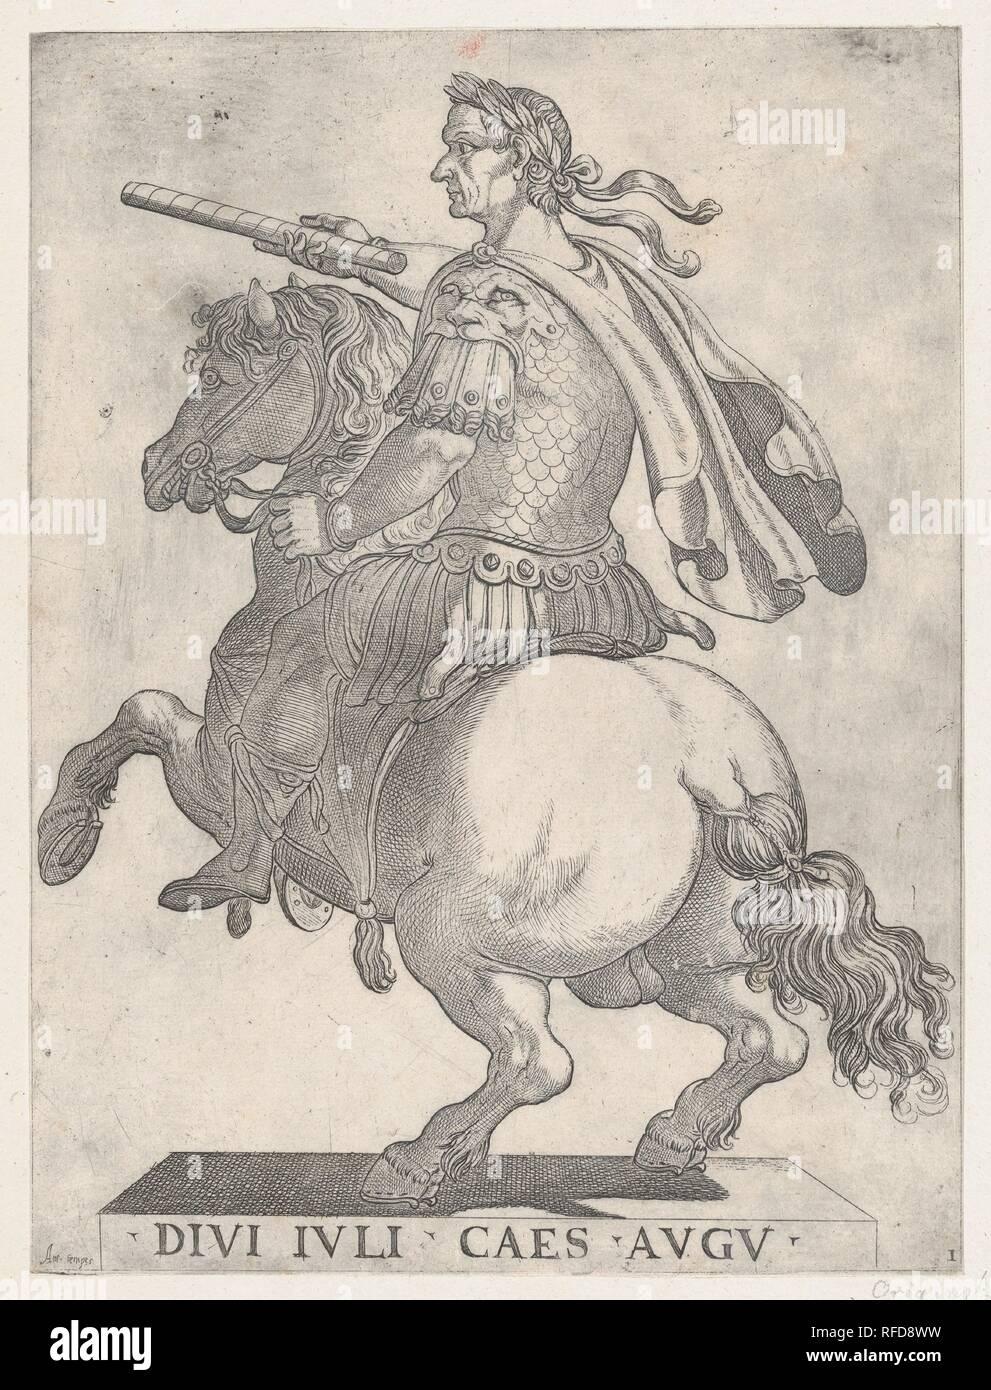 Plate 1: Emperor Julius Caesar on Horseback, from 'The First Twelve Roman Caesars'. Artist: Antonio Tempesta (Italian, Florence 1555-1630 Rome). Dimensions: Sheet: 11 7/8 × 8 7/8 in. (30.2 × 22.5 cm). Publisher: Giovanni Battista di Lazzaro Panzera da Parma (Italian, born 1541, active Rome 1577-98). Date: 1596. Museum: Metropolitan Museum of Art, New York, USA. Stock Photo